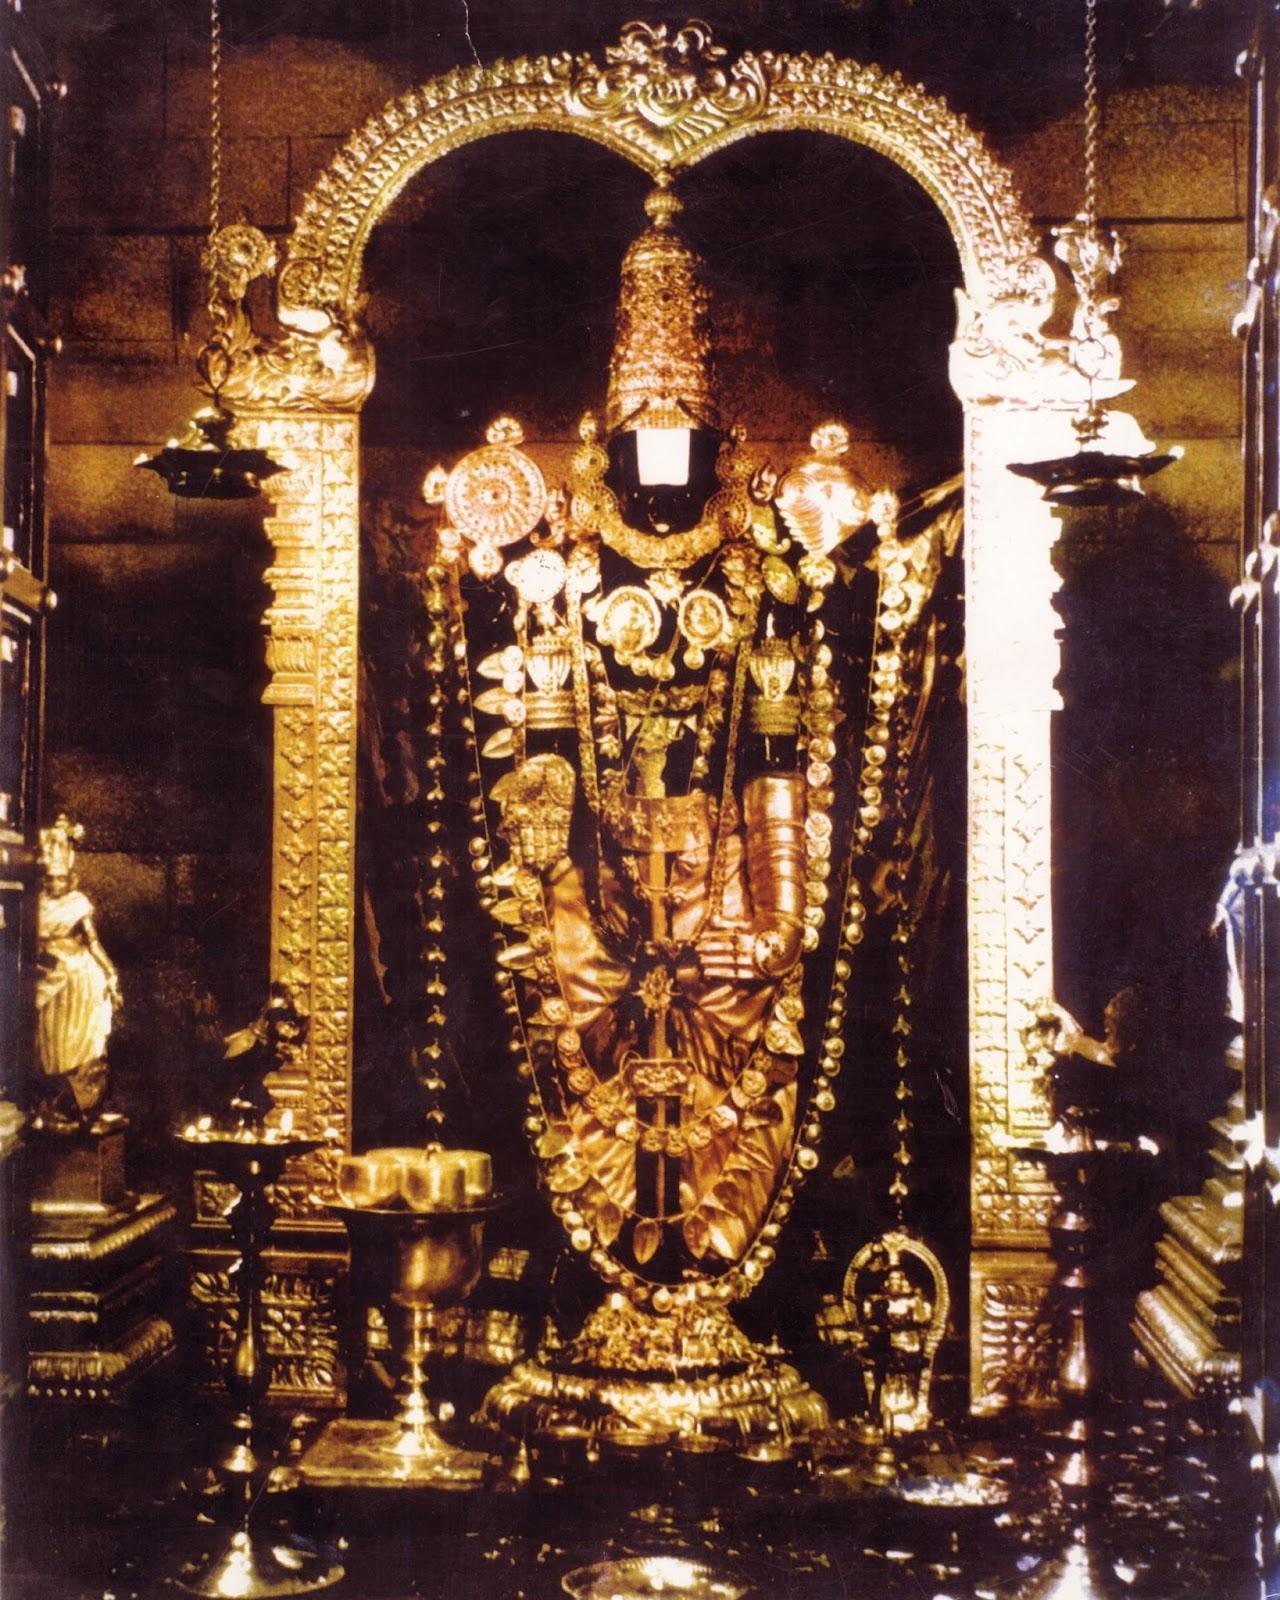 an essay on the tirupathi balaji temple Story of lord venkateshwara  he ran to the tirupathi temple of lord vishnu  so we see white covering on the god's idol and the presiding god is called balaji.